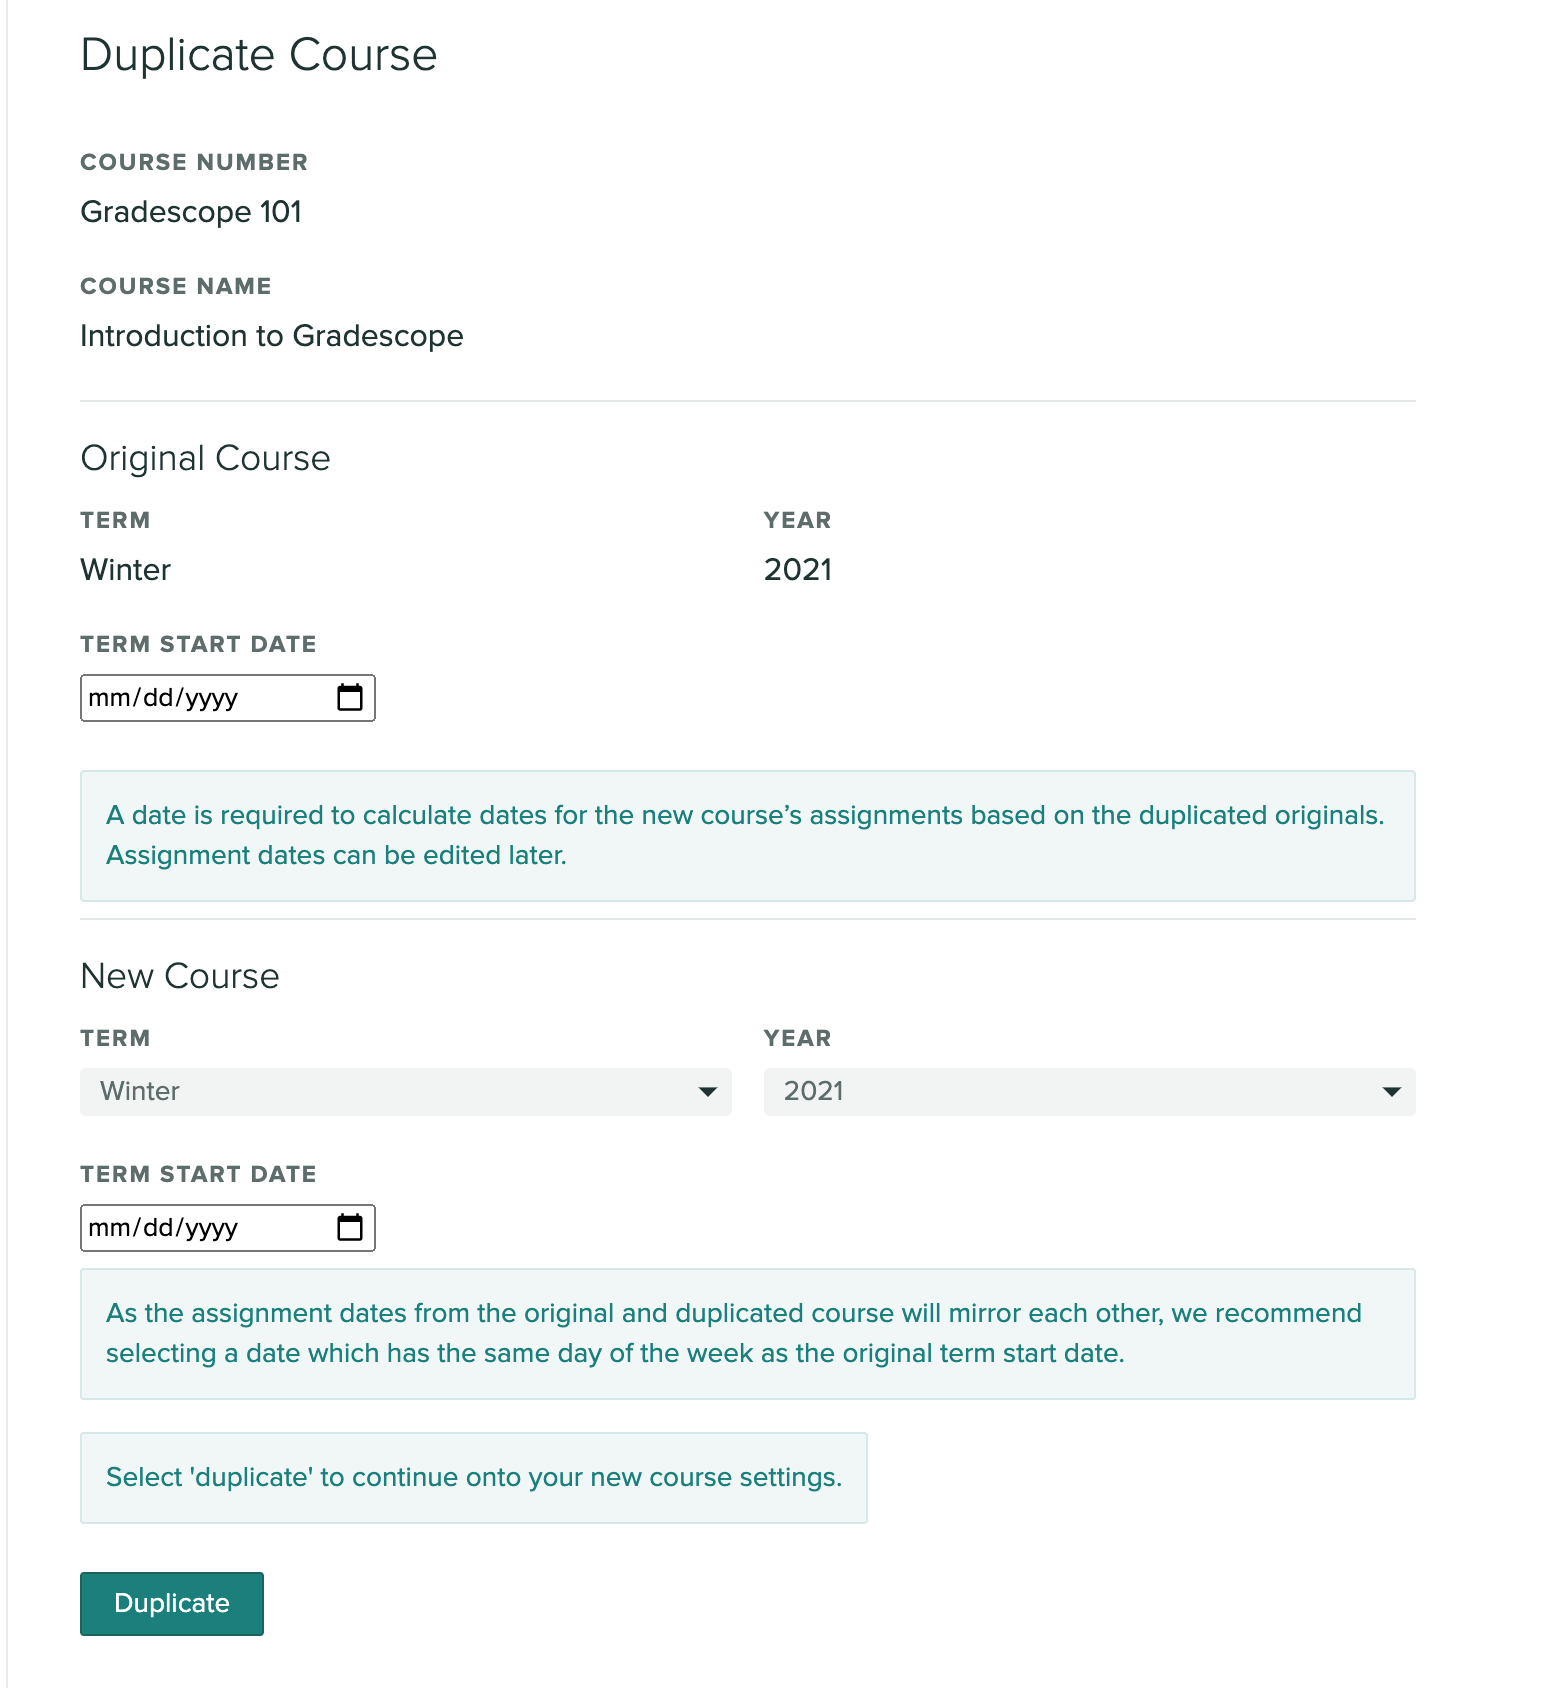 Duplicate course settings